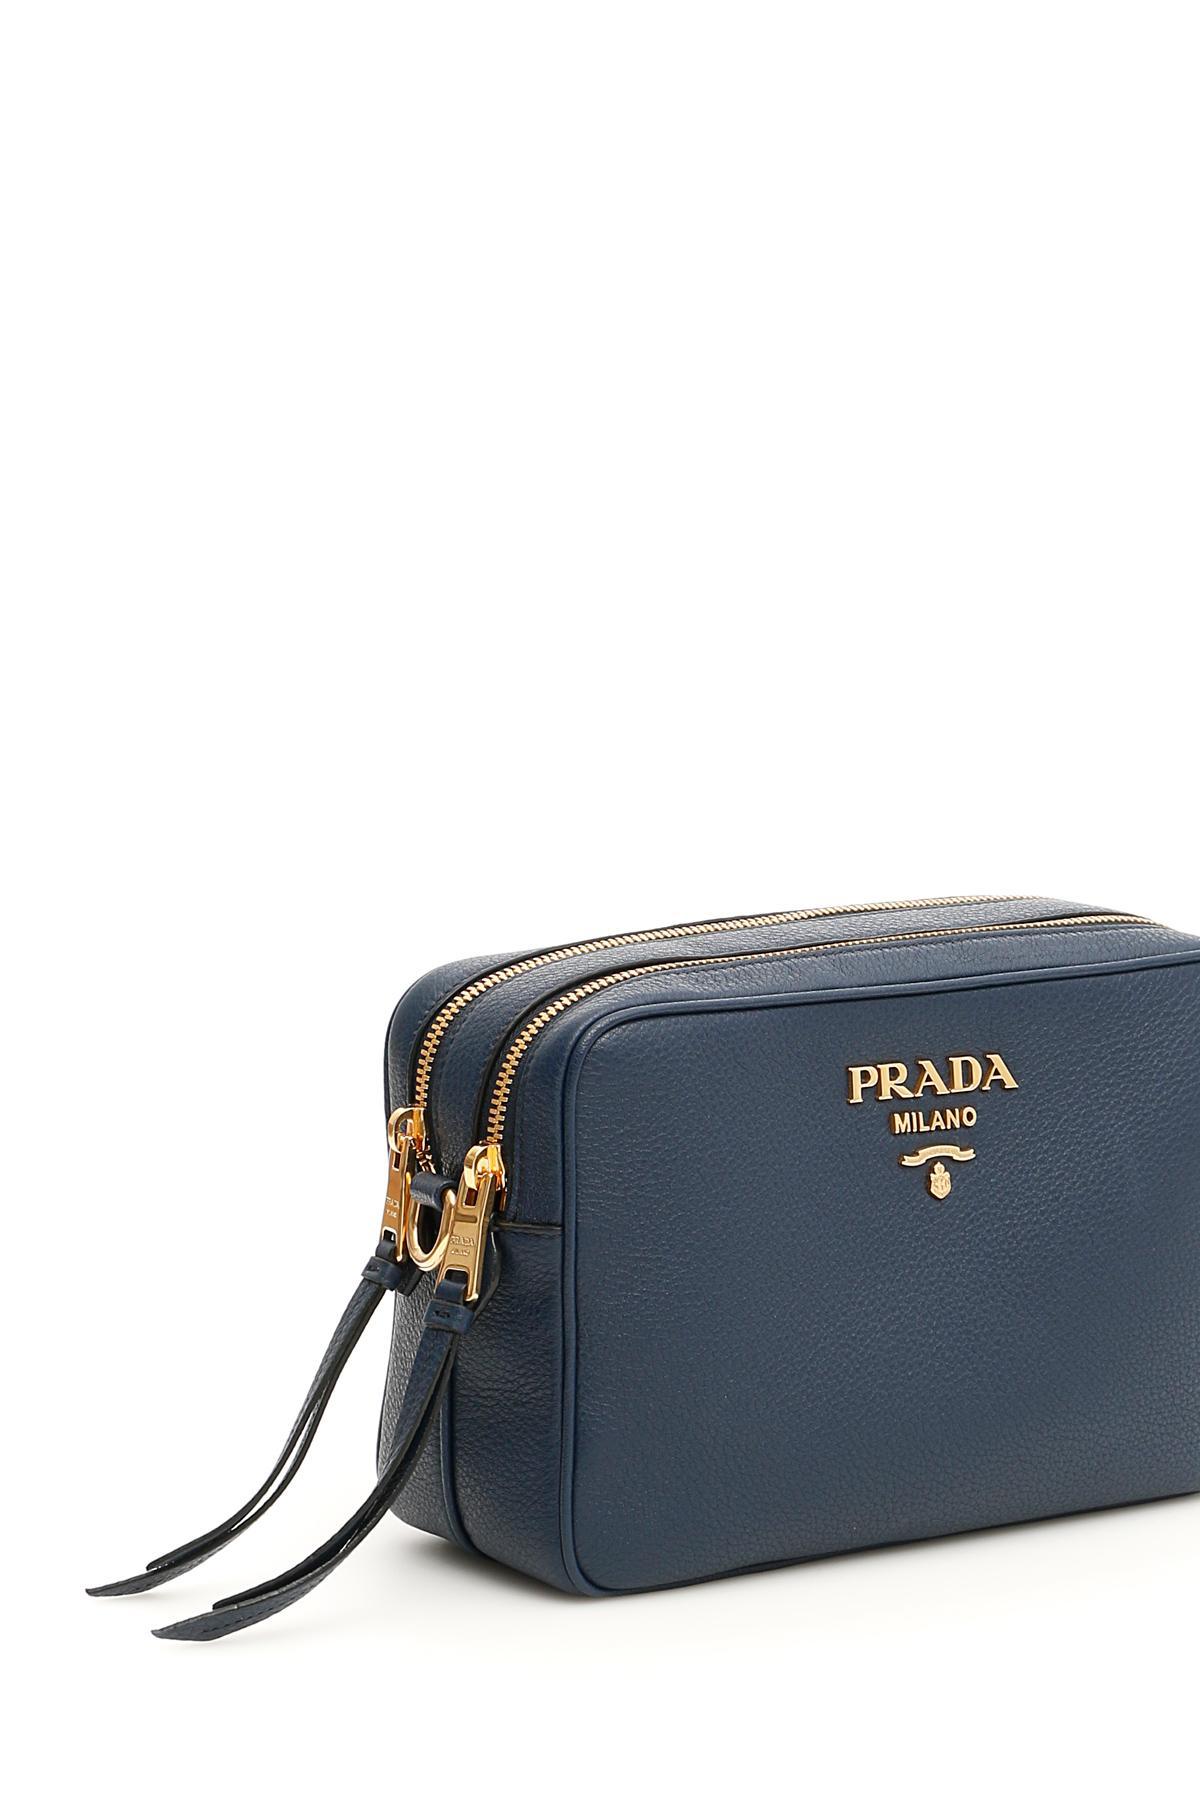 64d5af0cf4d382 Lyst - Prada Calfskin Crossbody Bag in Blue